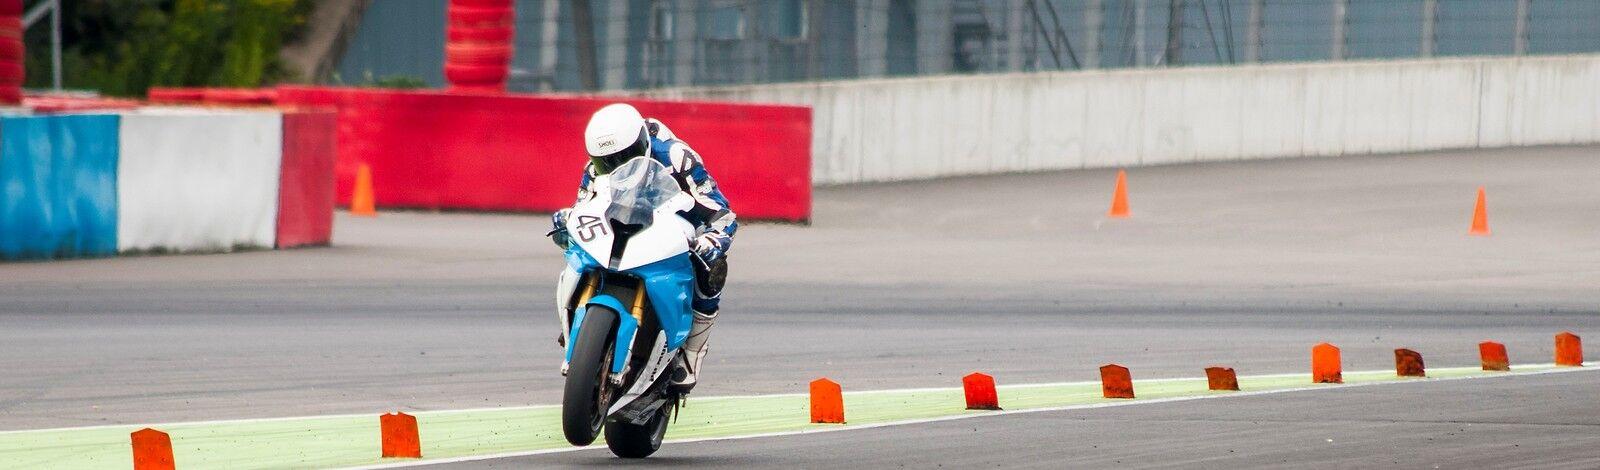 race-now